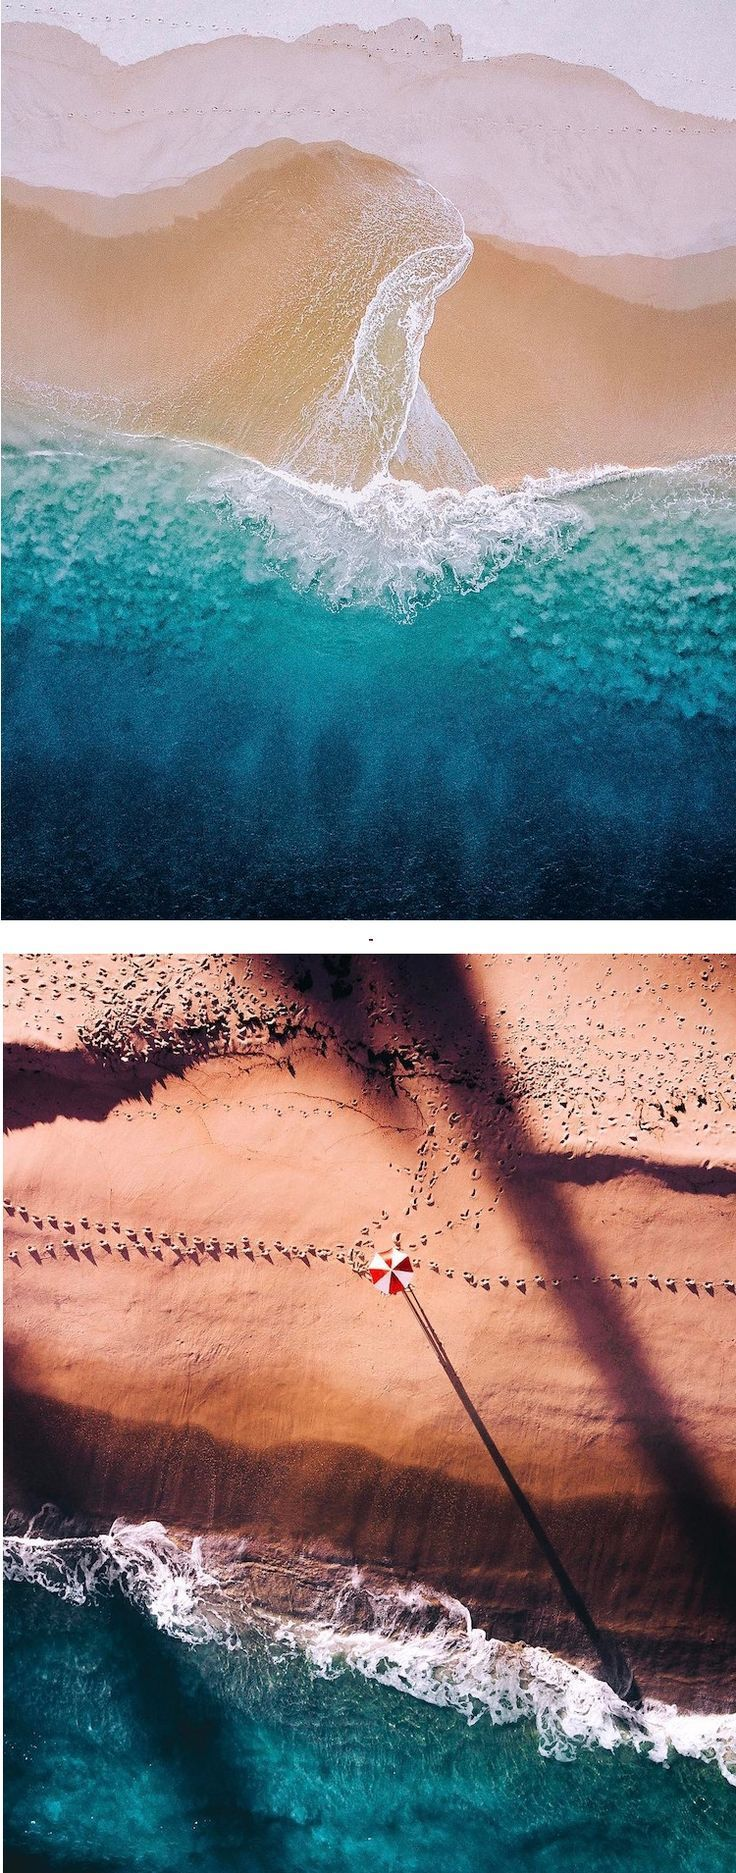 Best Spectacular Photography Images On Pinterest D Artwork - Photographer captures the beautiful diversity of australias fungi